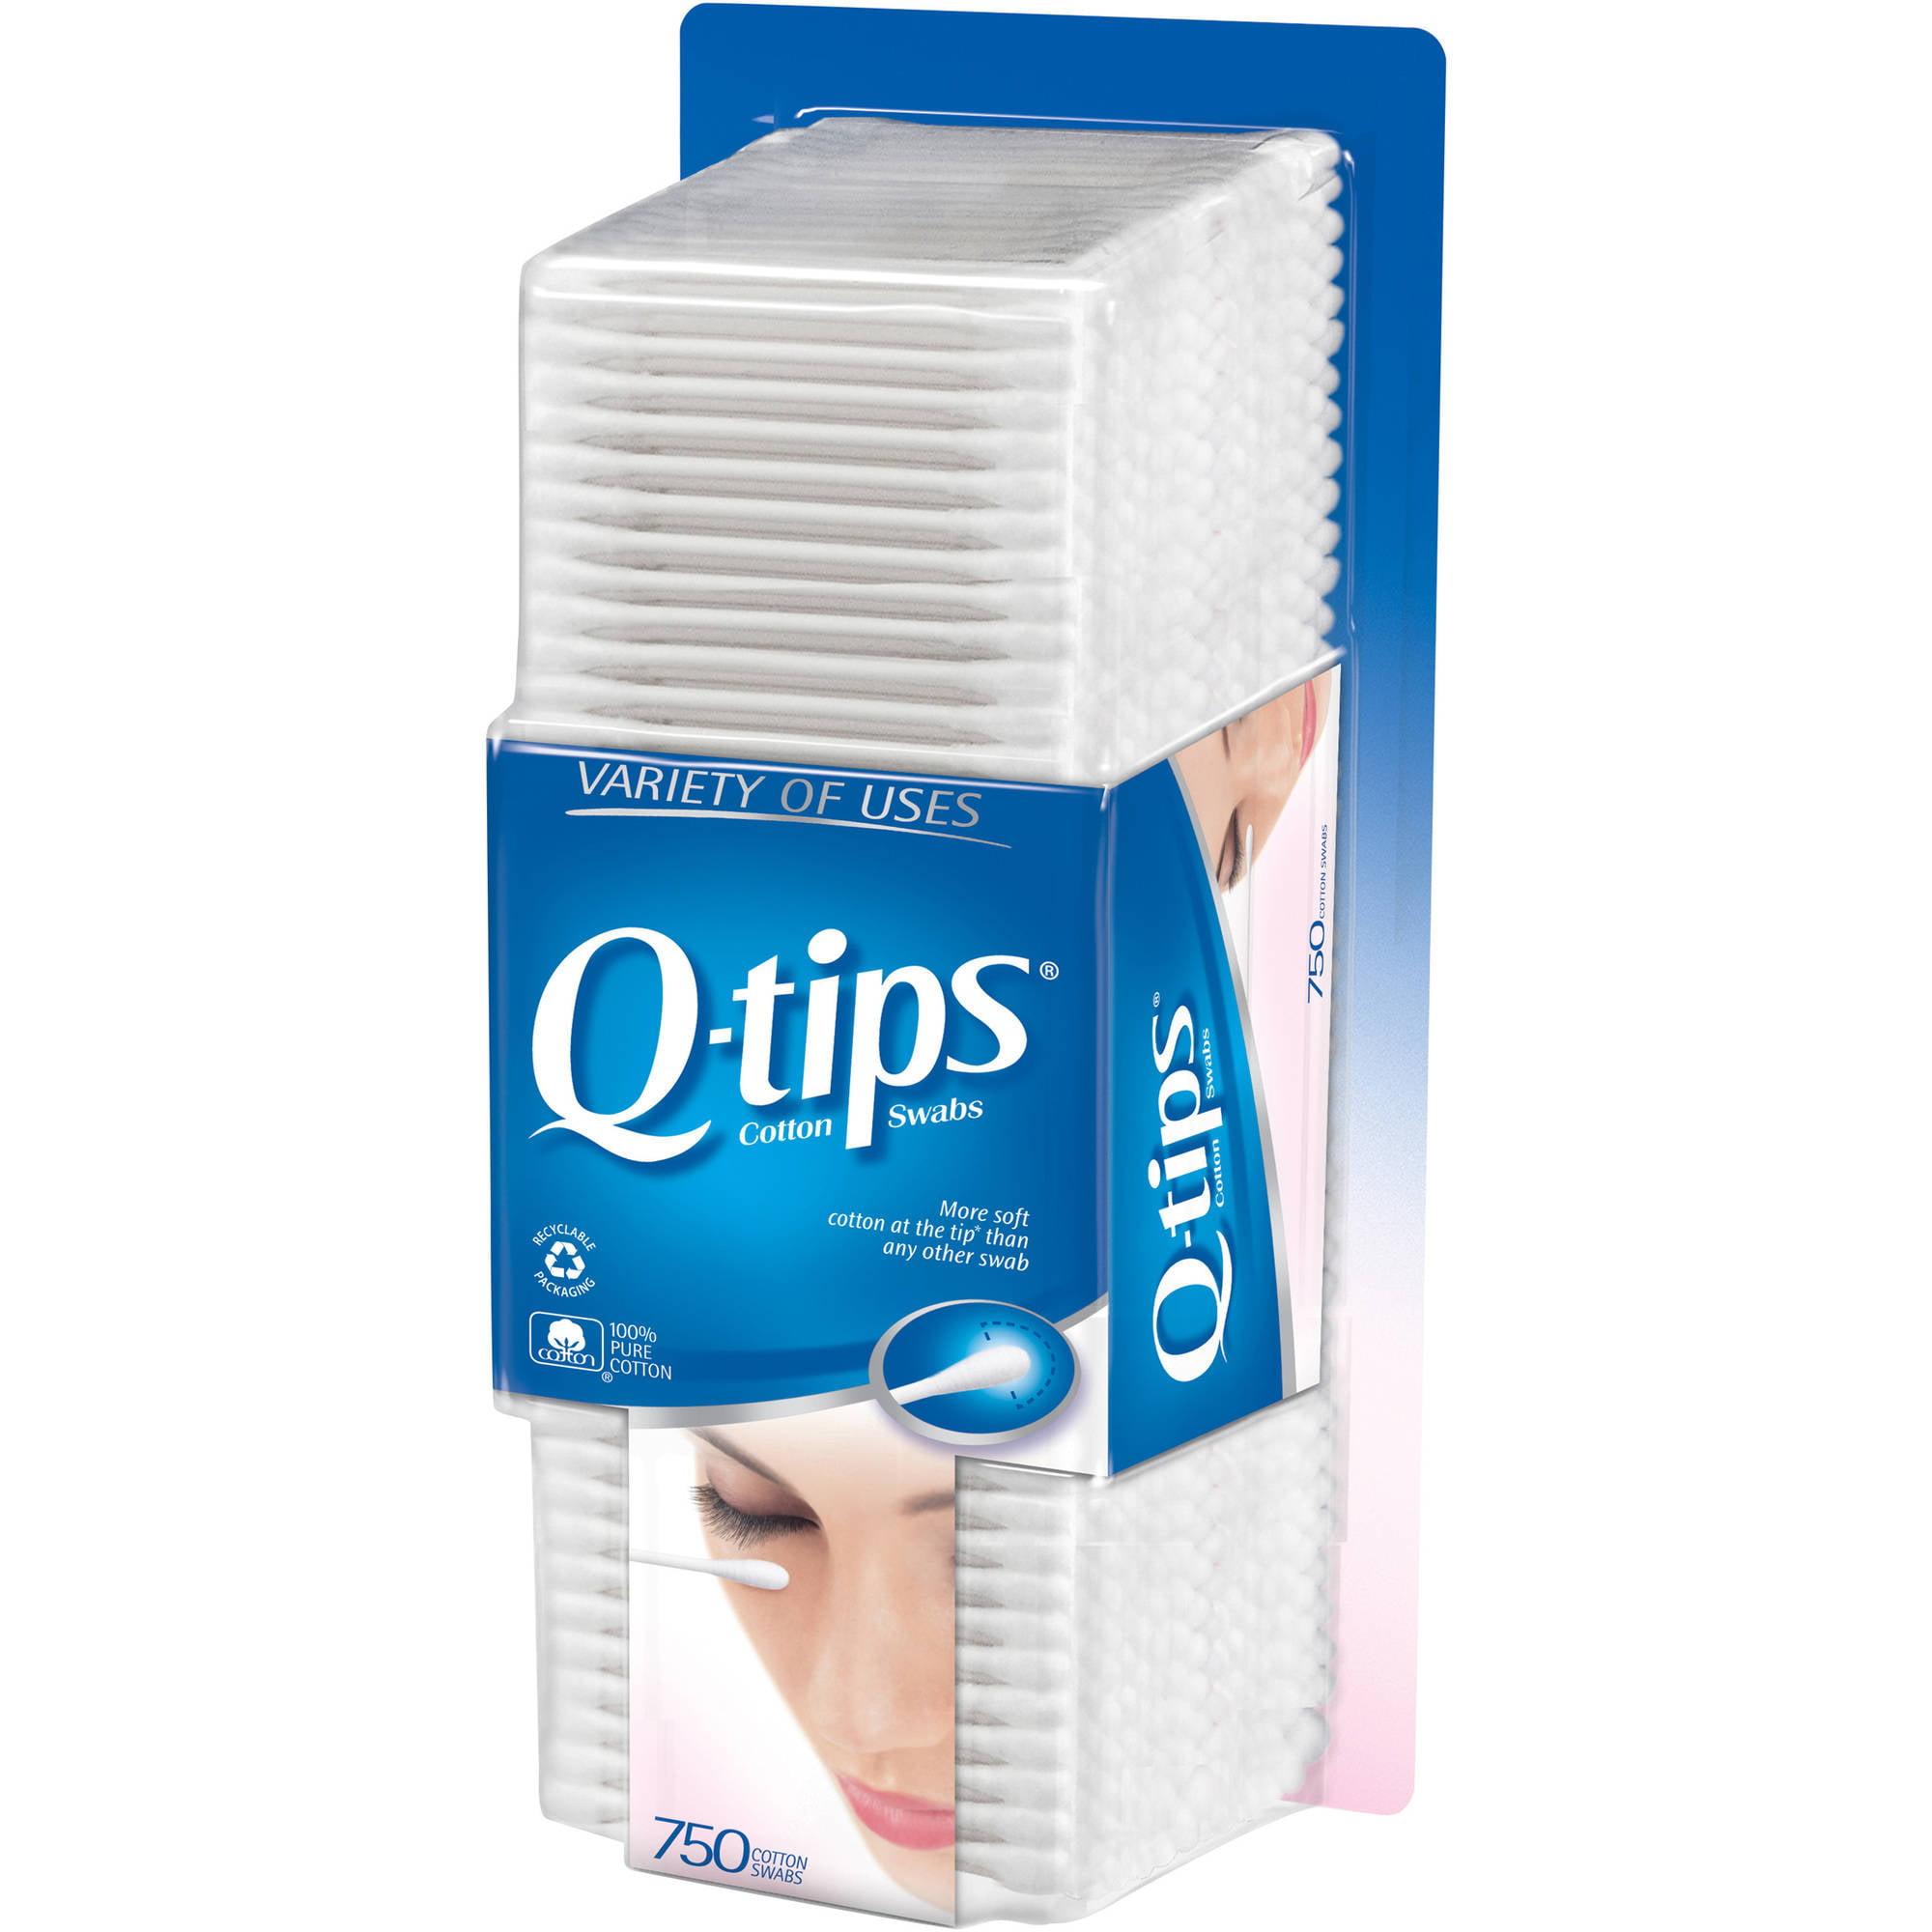 Q-tips Cotton Swabs, 750 count